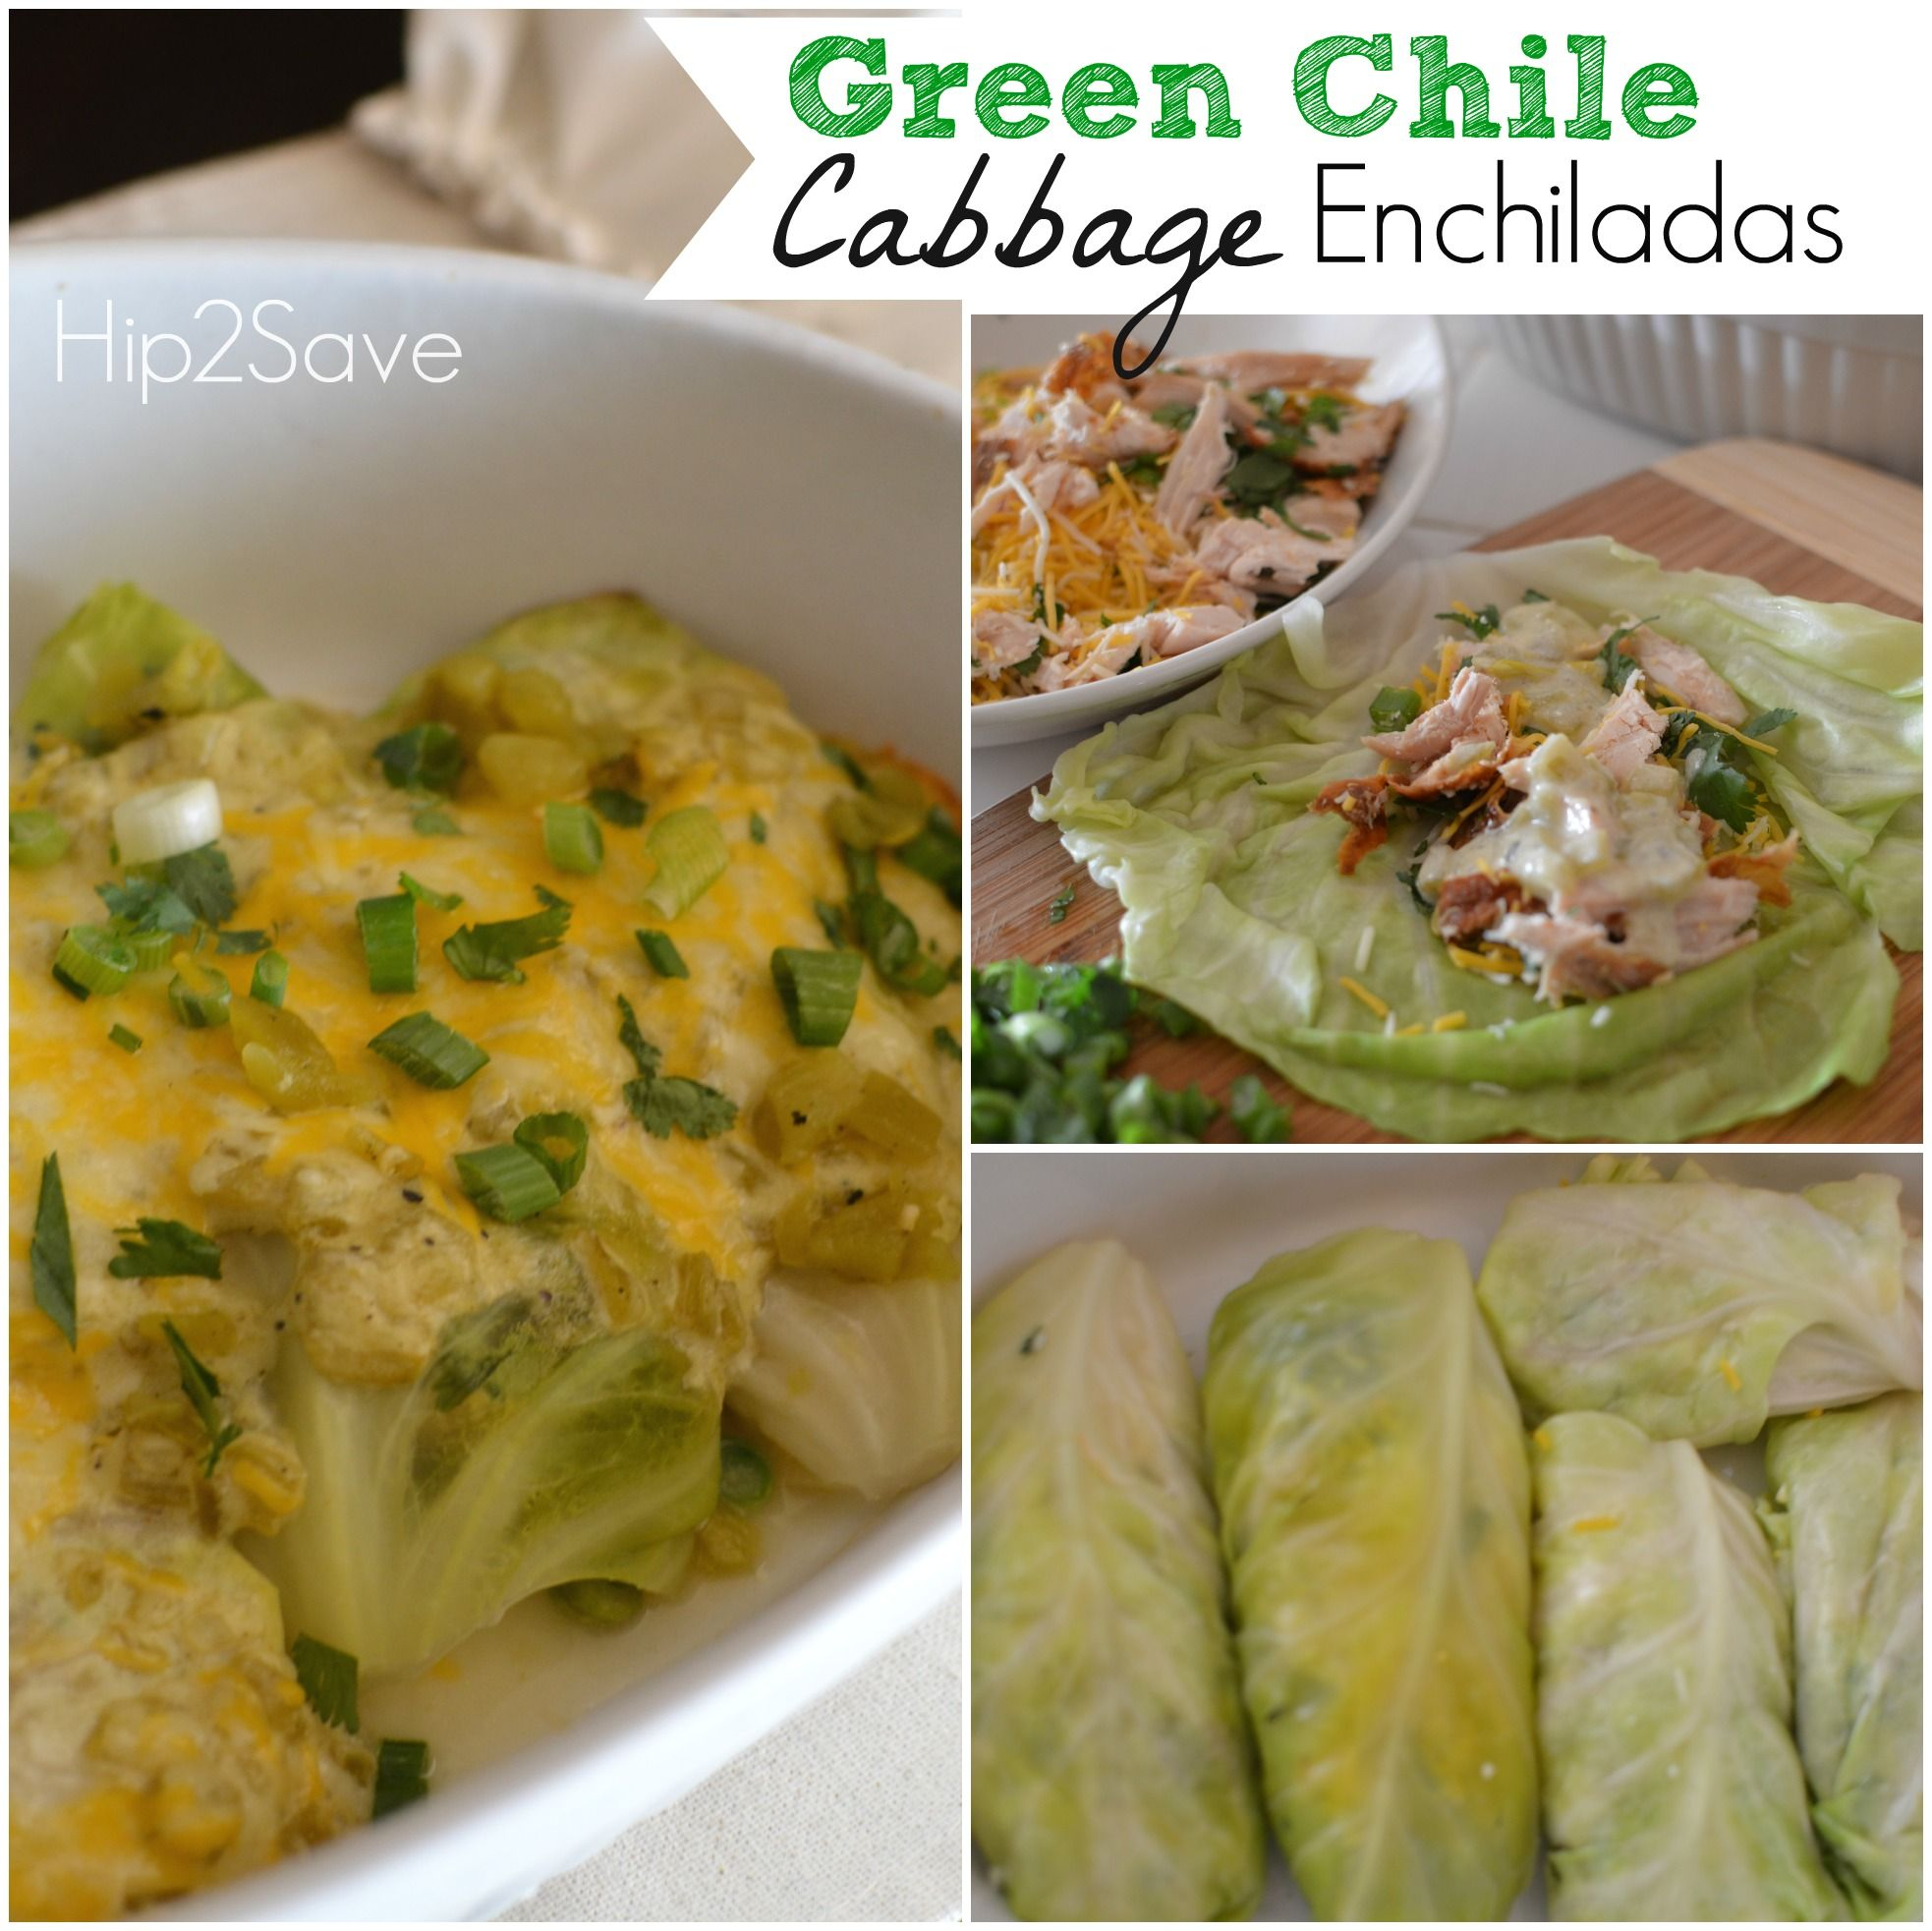 Green Chile Cabbage Enchiladas Recipe | Cabbages, Cream ...